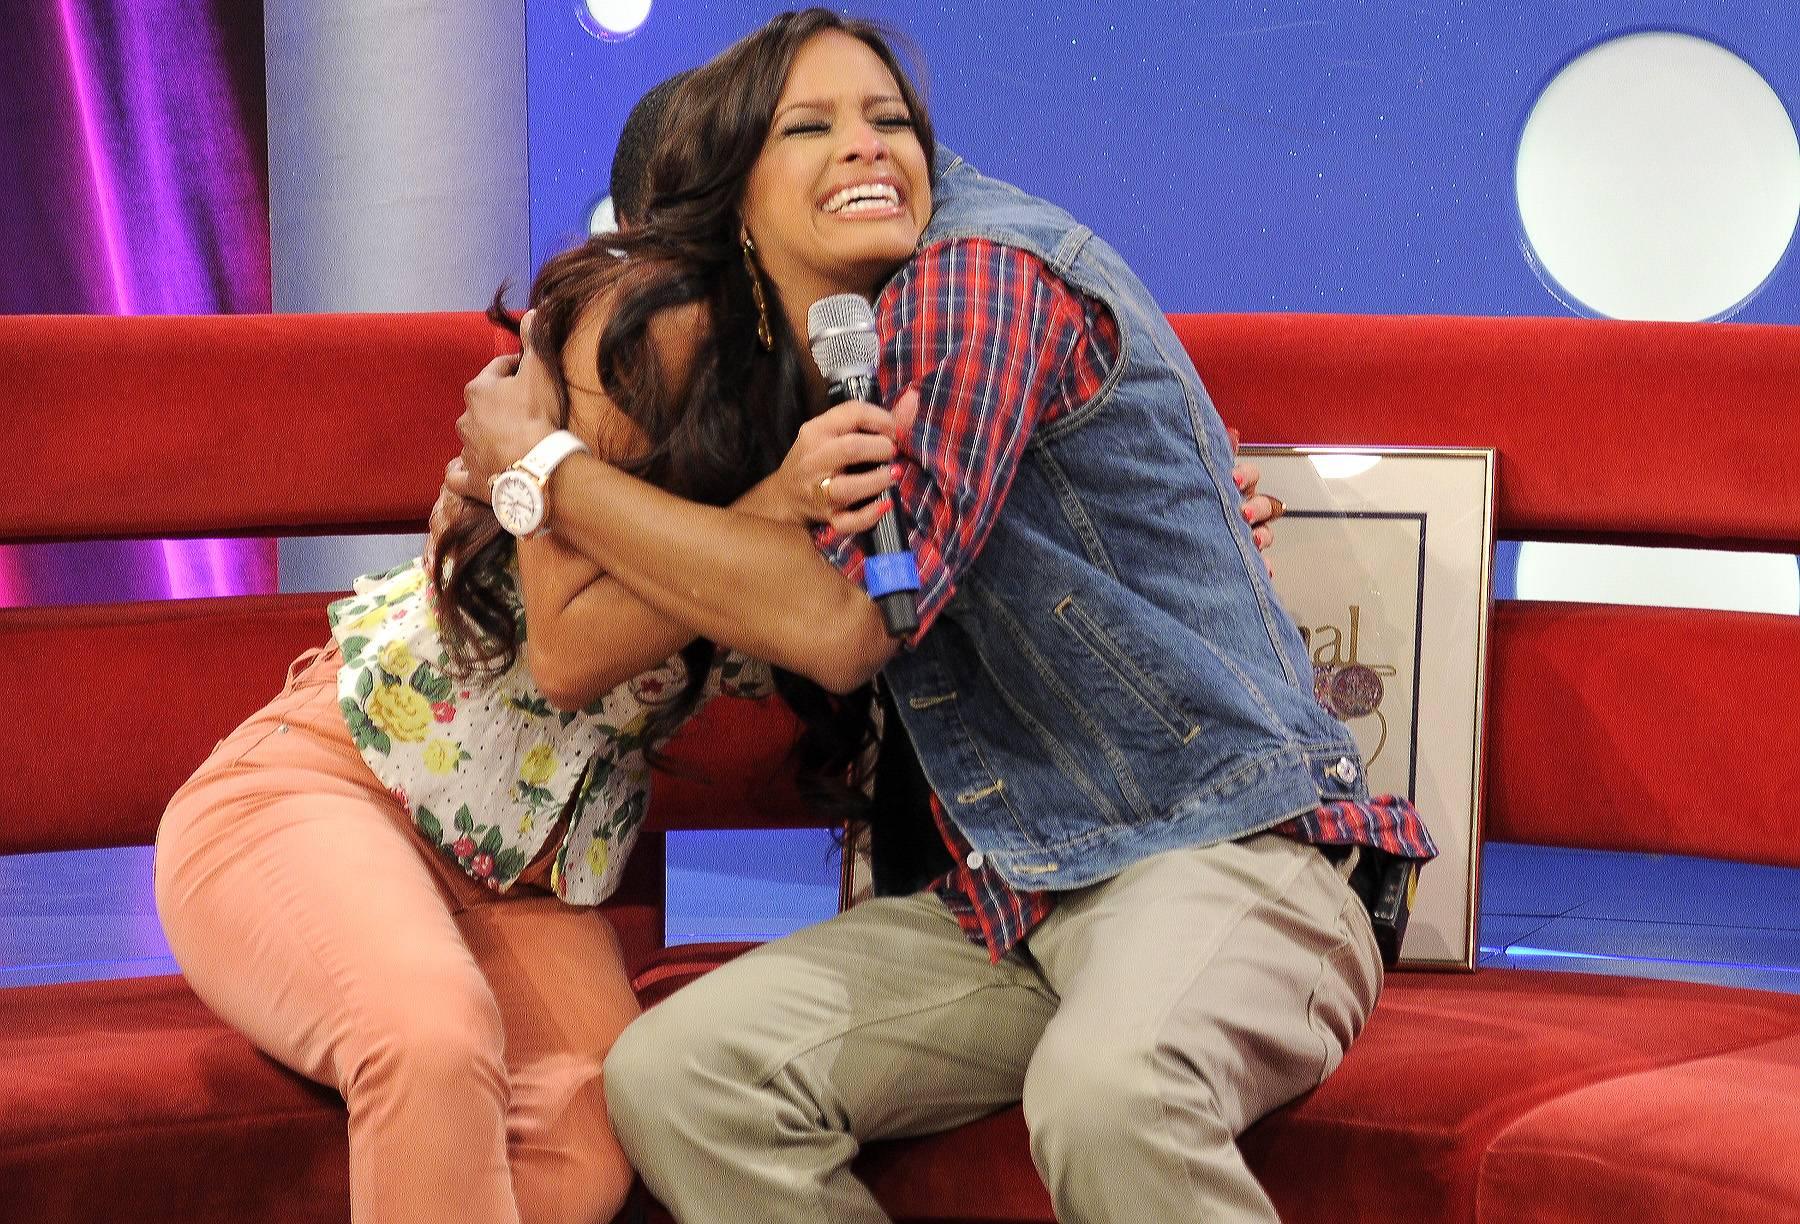 All Hugs - Terrence J shows his appreciated to Rocsi Diaz at 106 & Park, April 20, 2012. (Photo: John Ricard / BET)